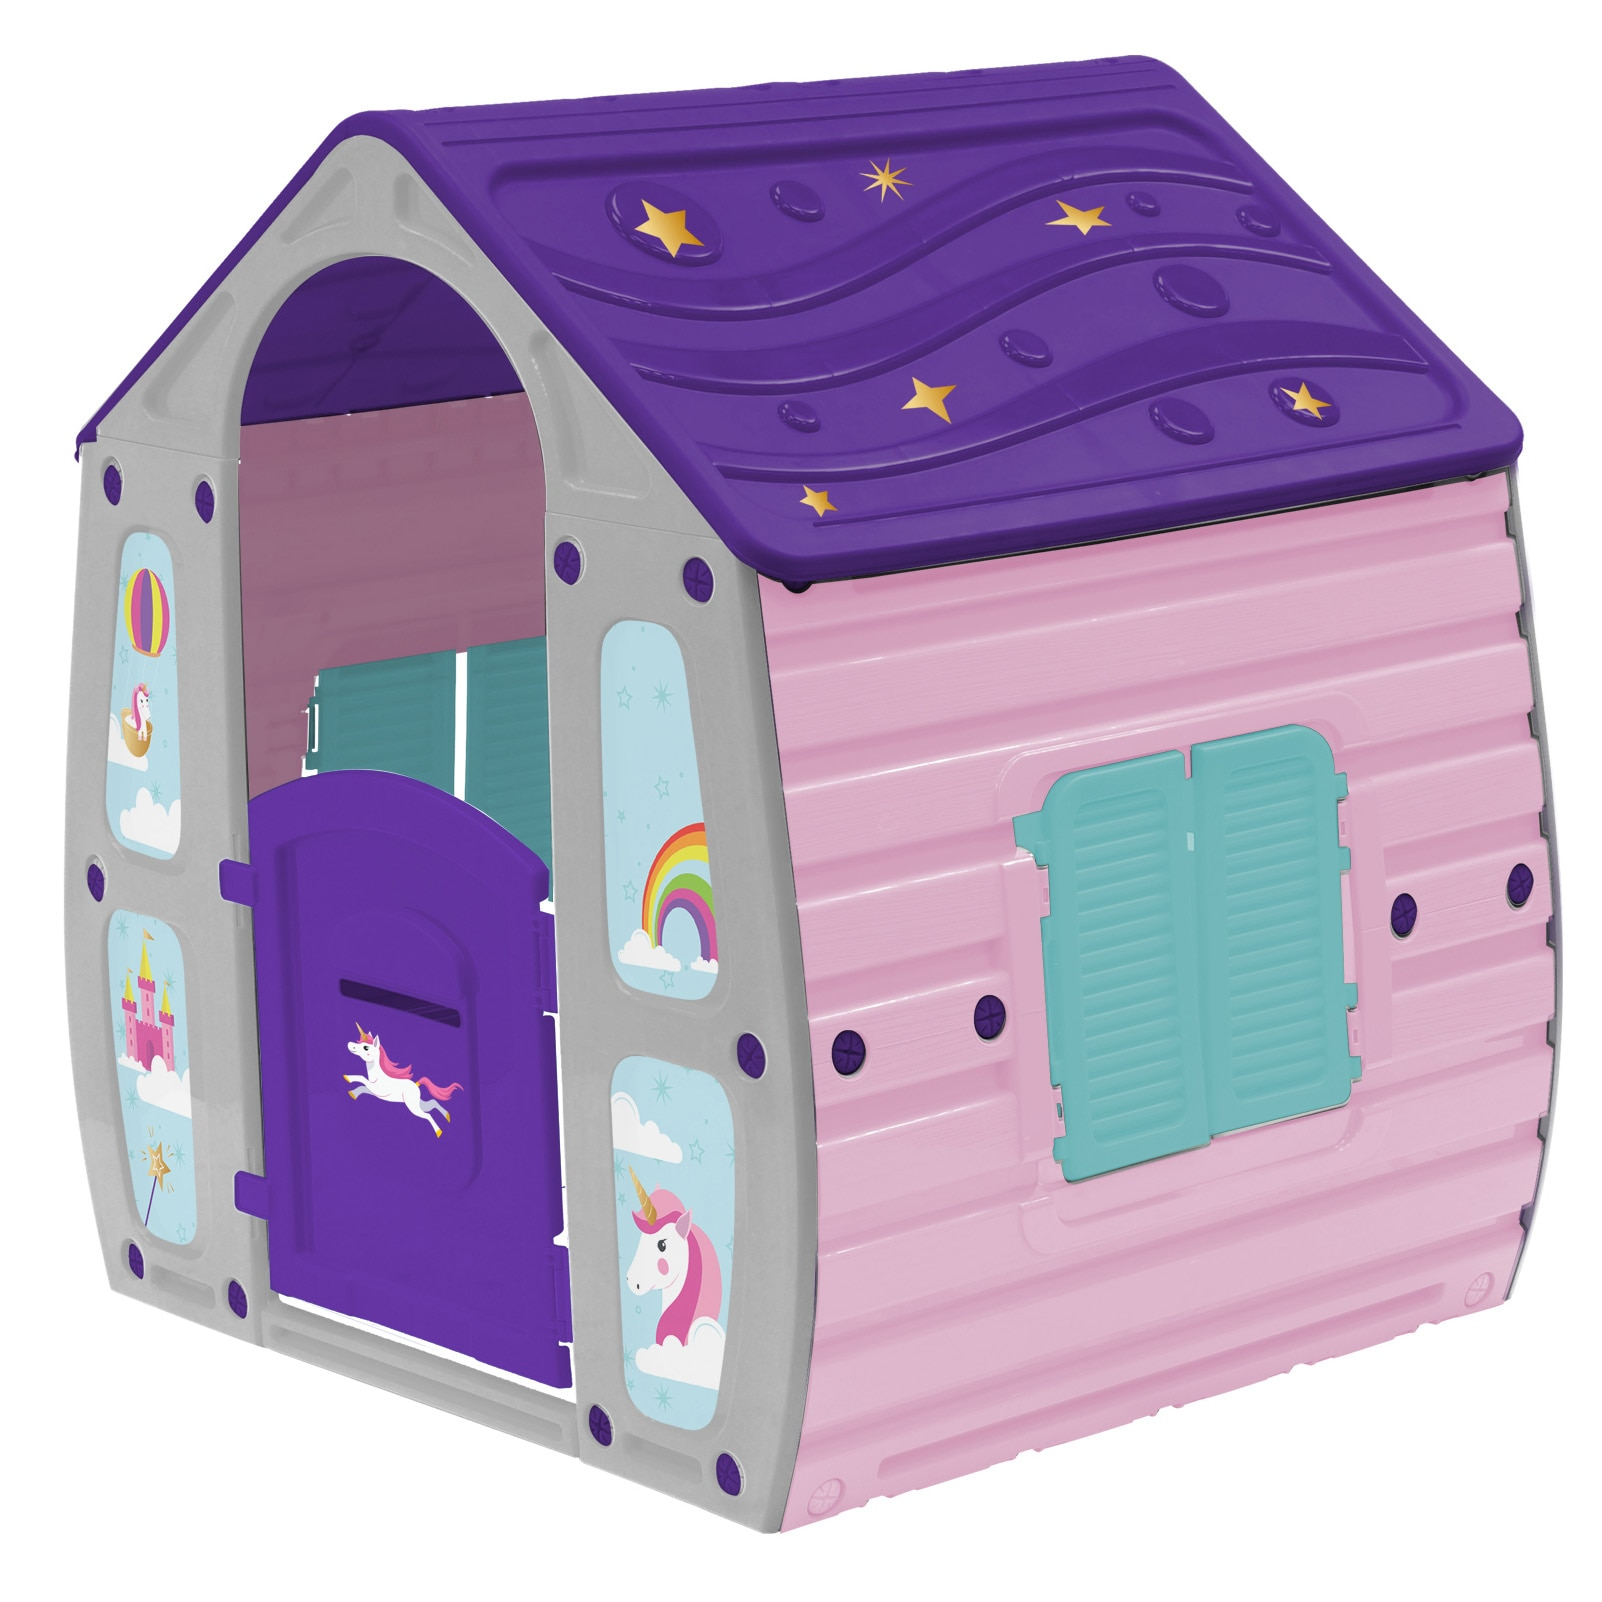 Fotografie Casuta de joaca pentru copii M-Toys Magic, roz / mov